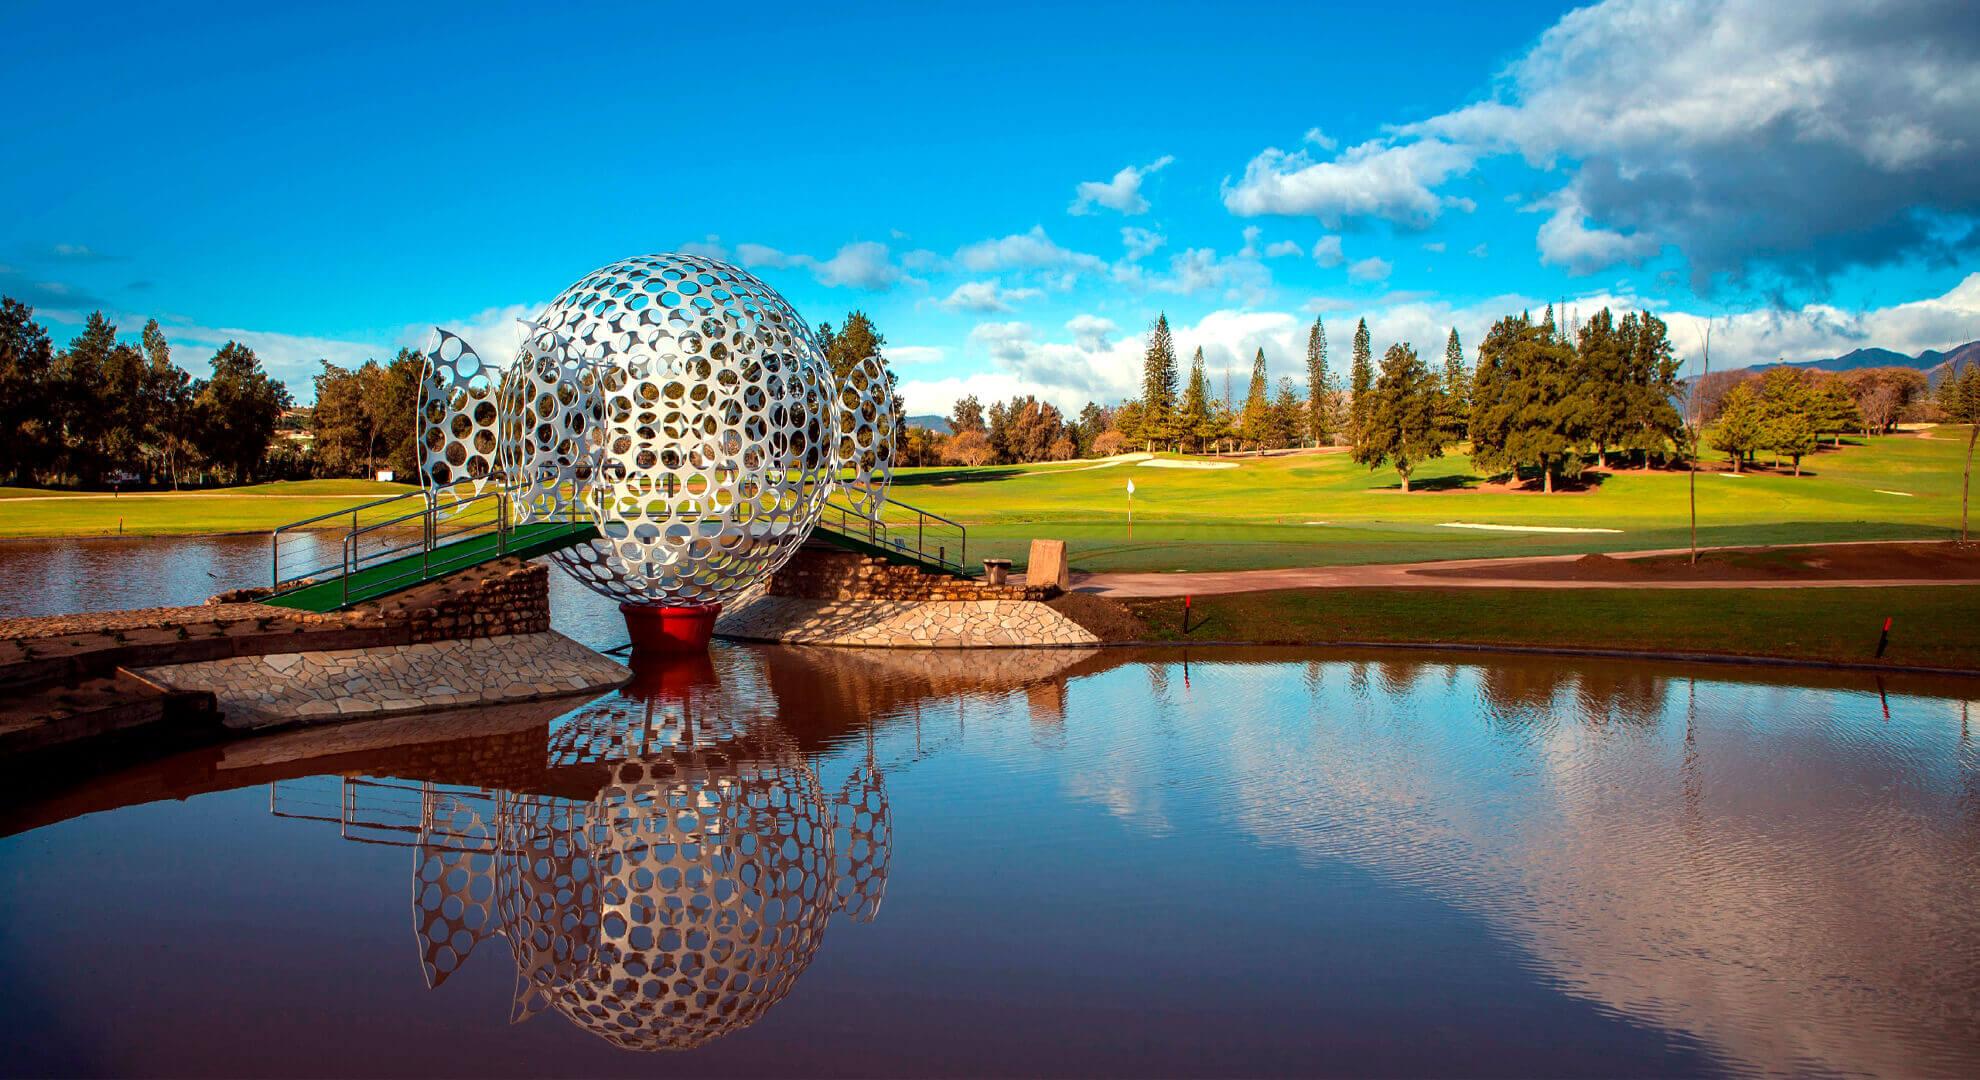 Mijas Golf Club Los Lagos, Spain